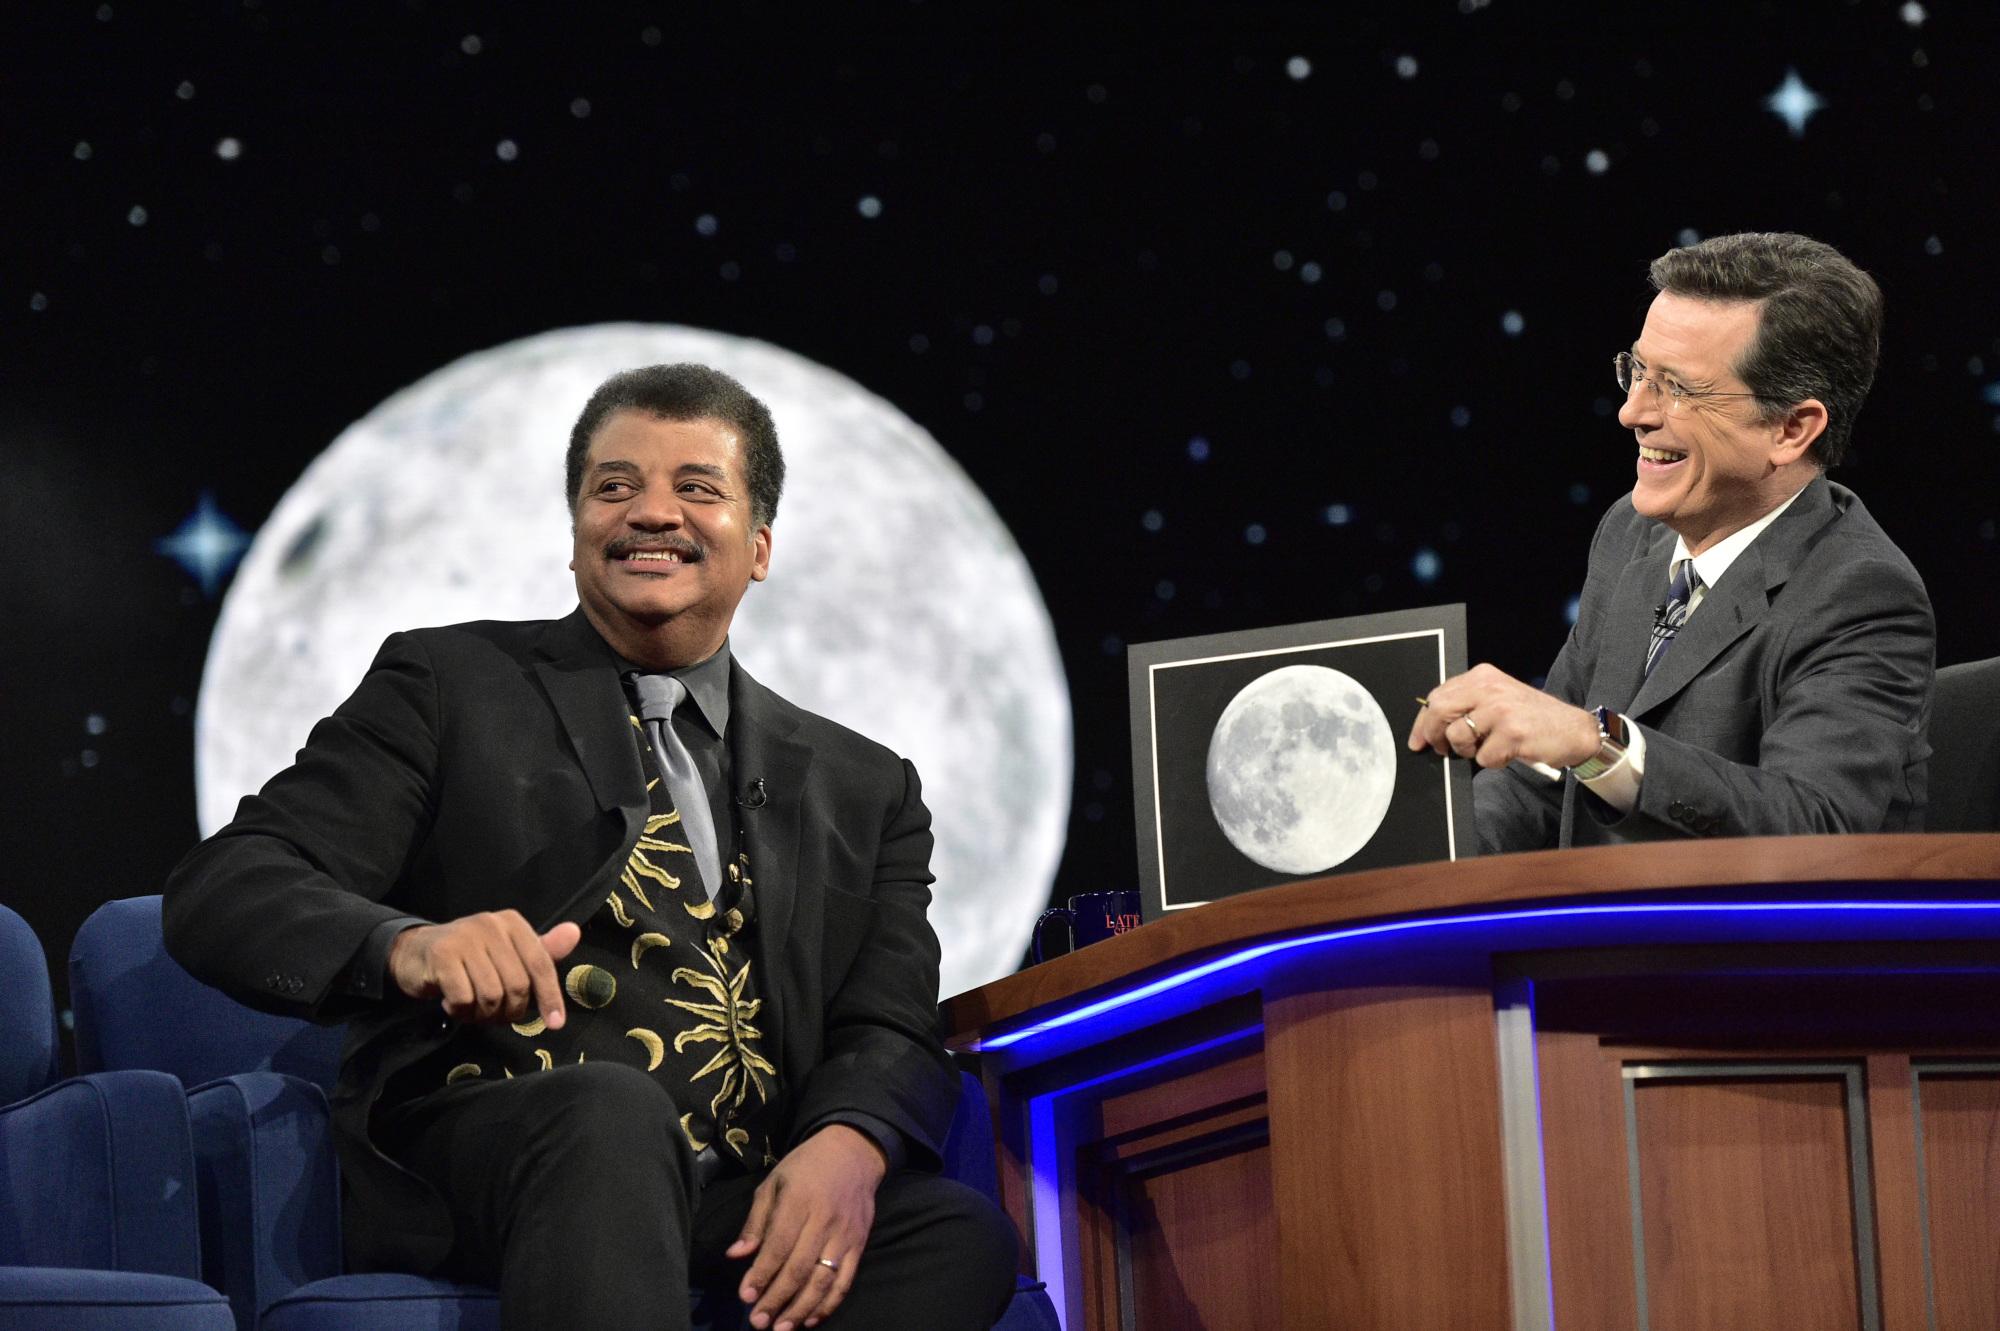 Neil deGrasse Tyson Explains The Strawberry Moon